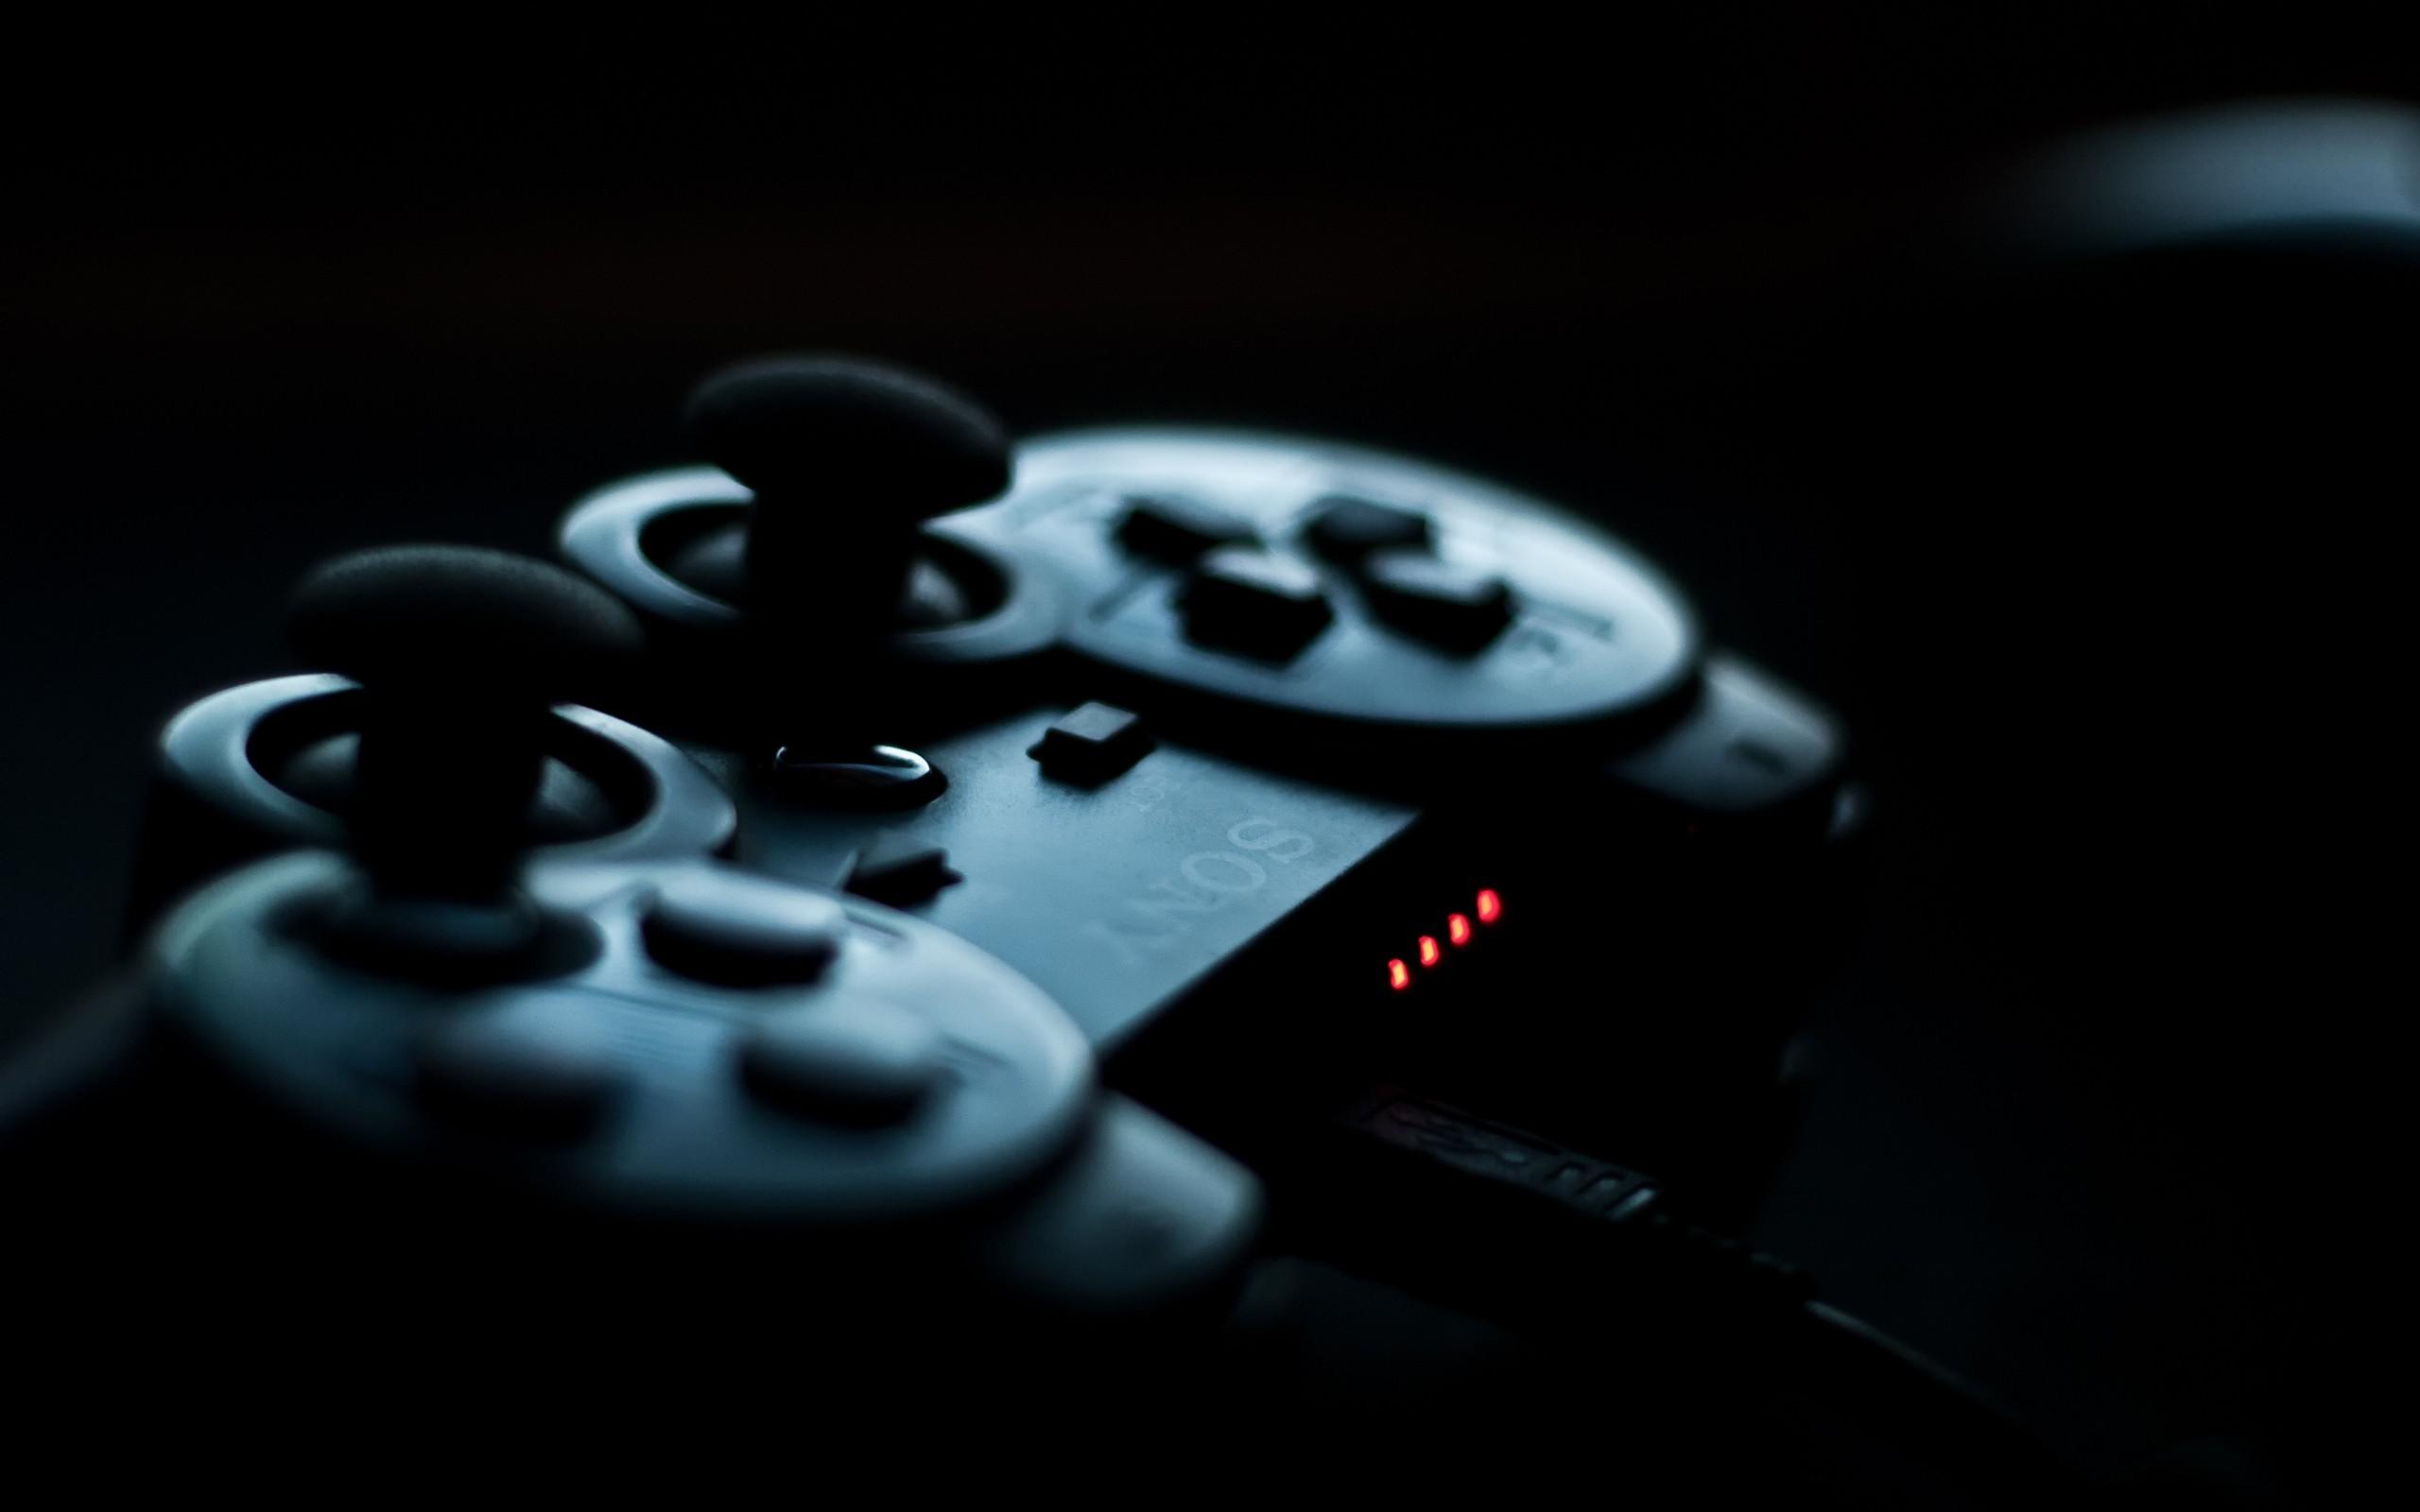 Image Dualshock, sony, dualshok, sony, playstation, playstation ...